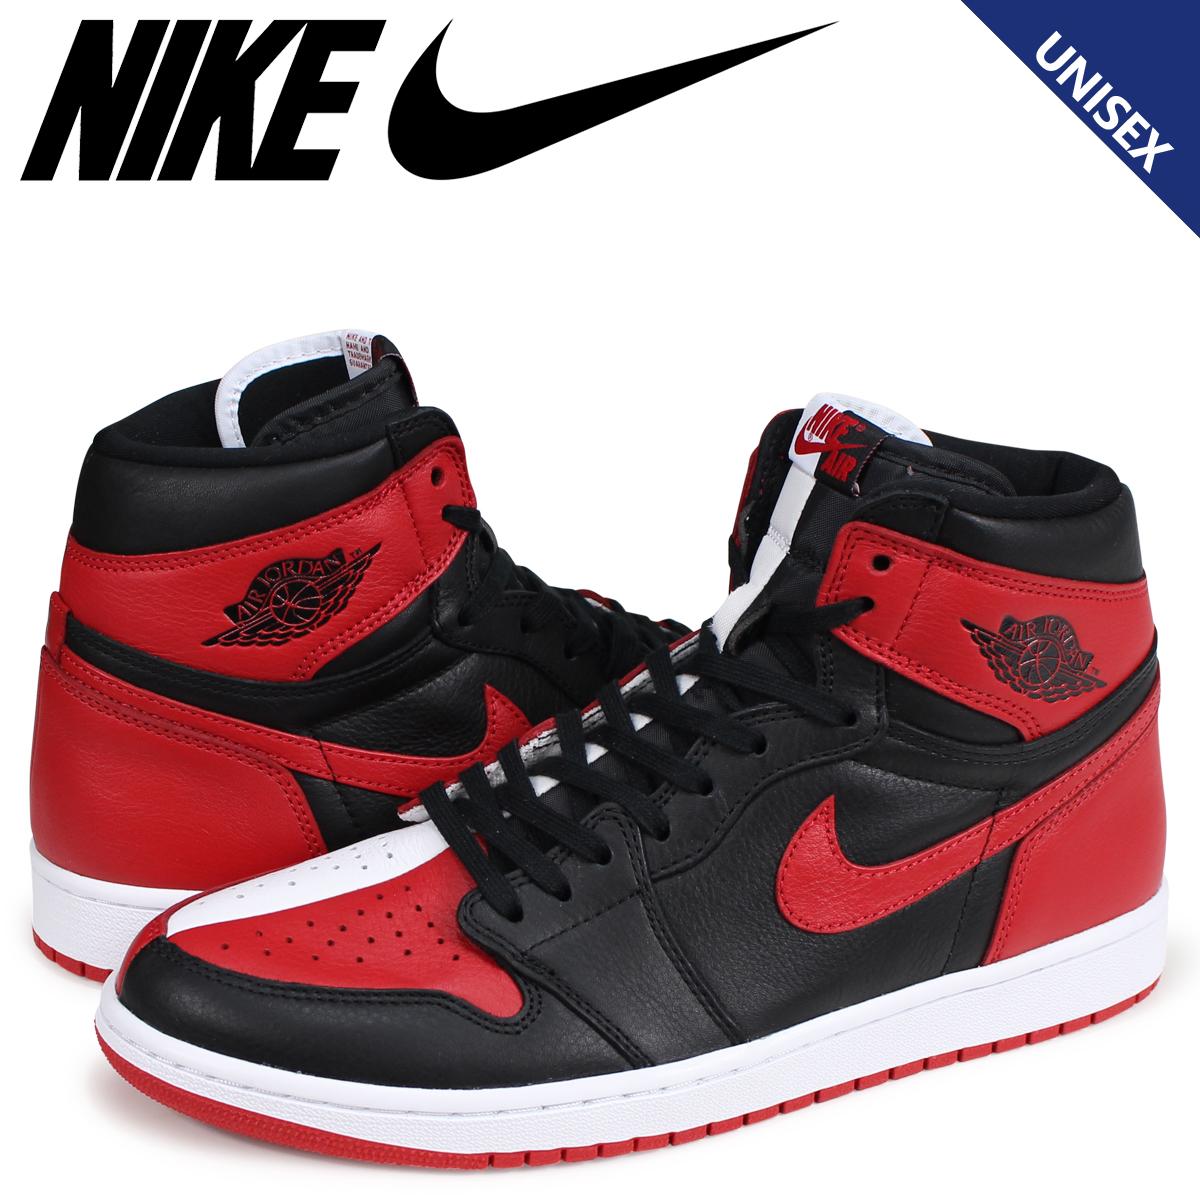 cheap for discount 5f5c0 b60ad NIKE AIR JORDAN 1 RETRO HIGH OG HOMAGE TO HOME Nike Air Jordan 1 sneakers  nostalgic high men gap Dis red 861,428-061